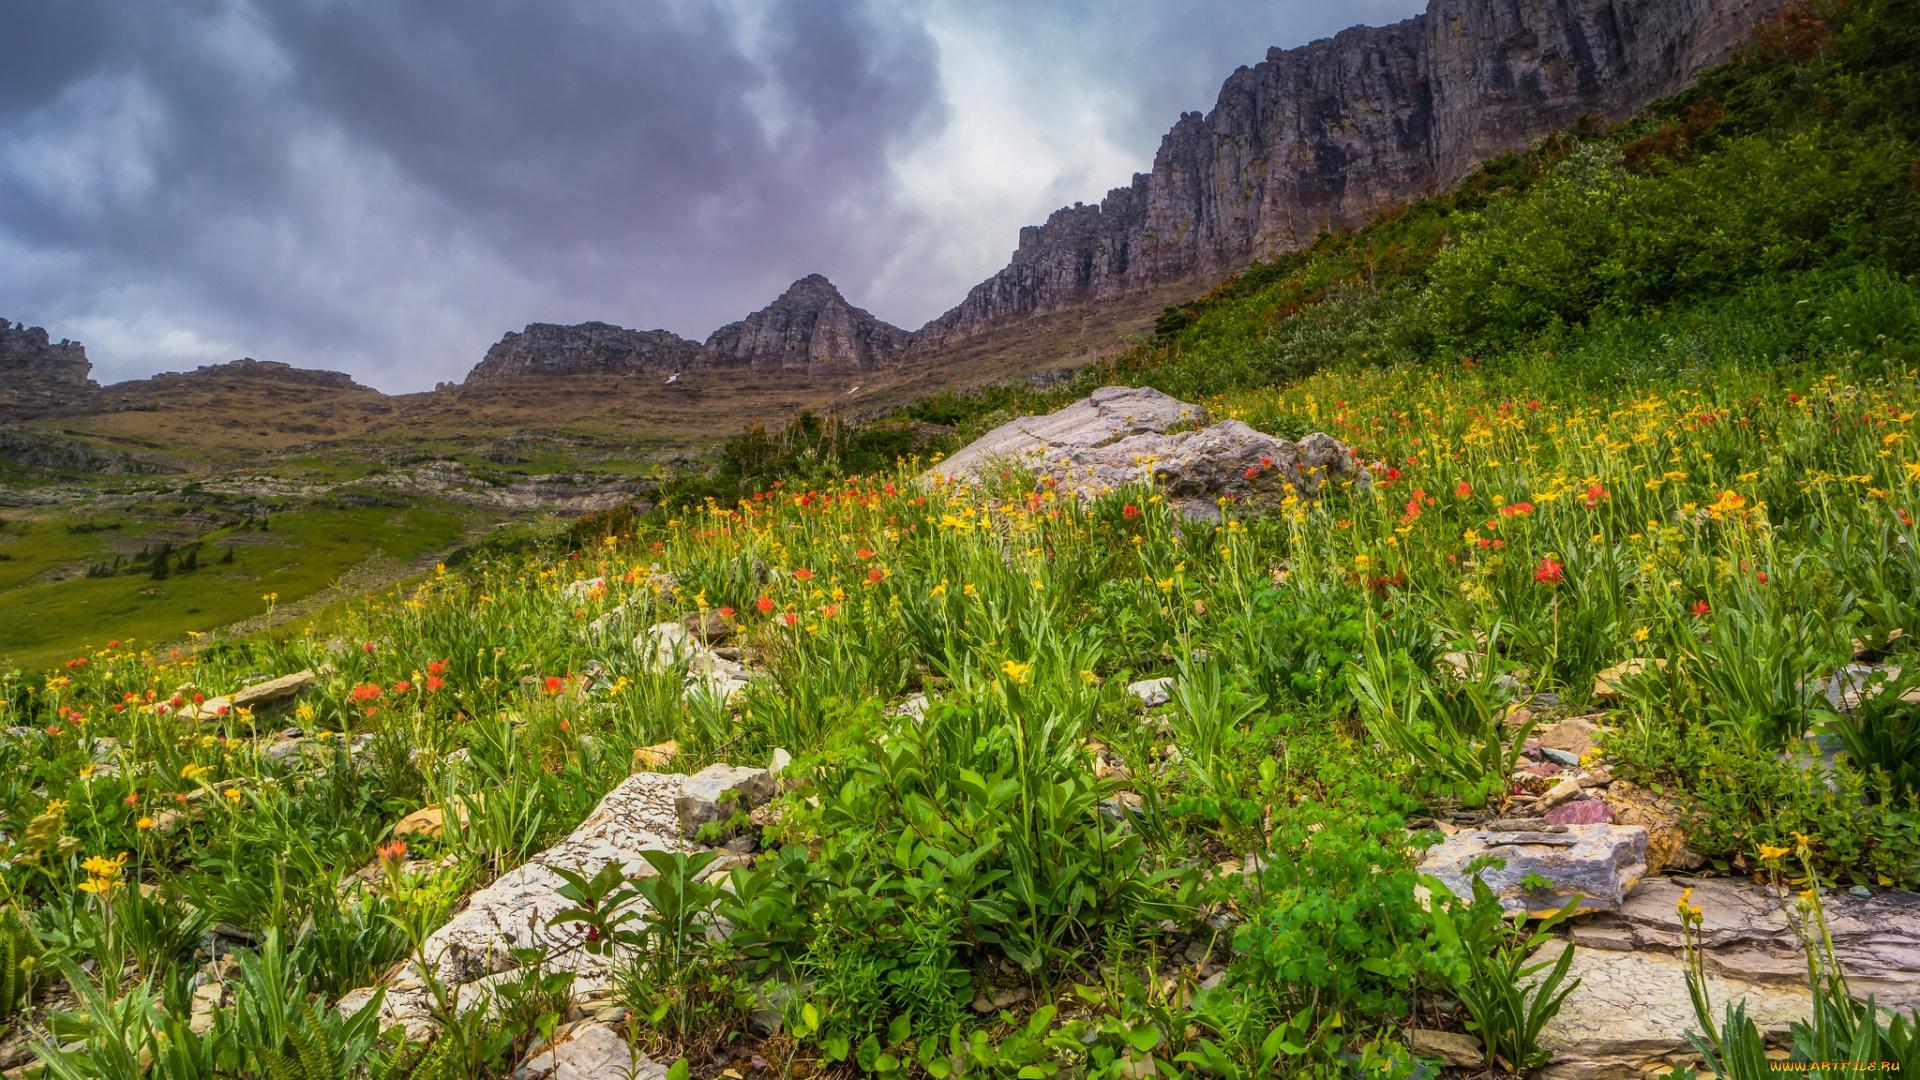 трава в горах без регистрации